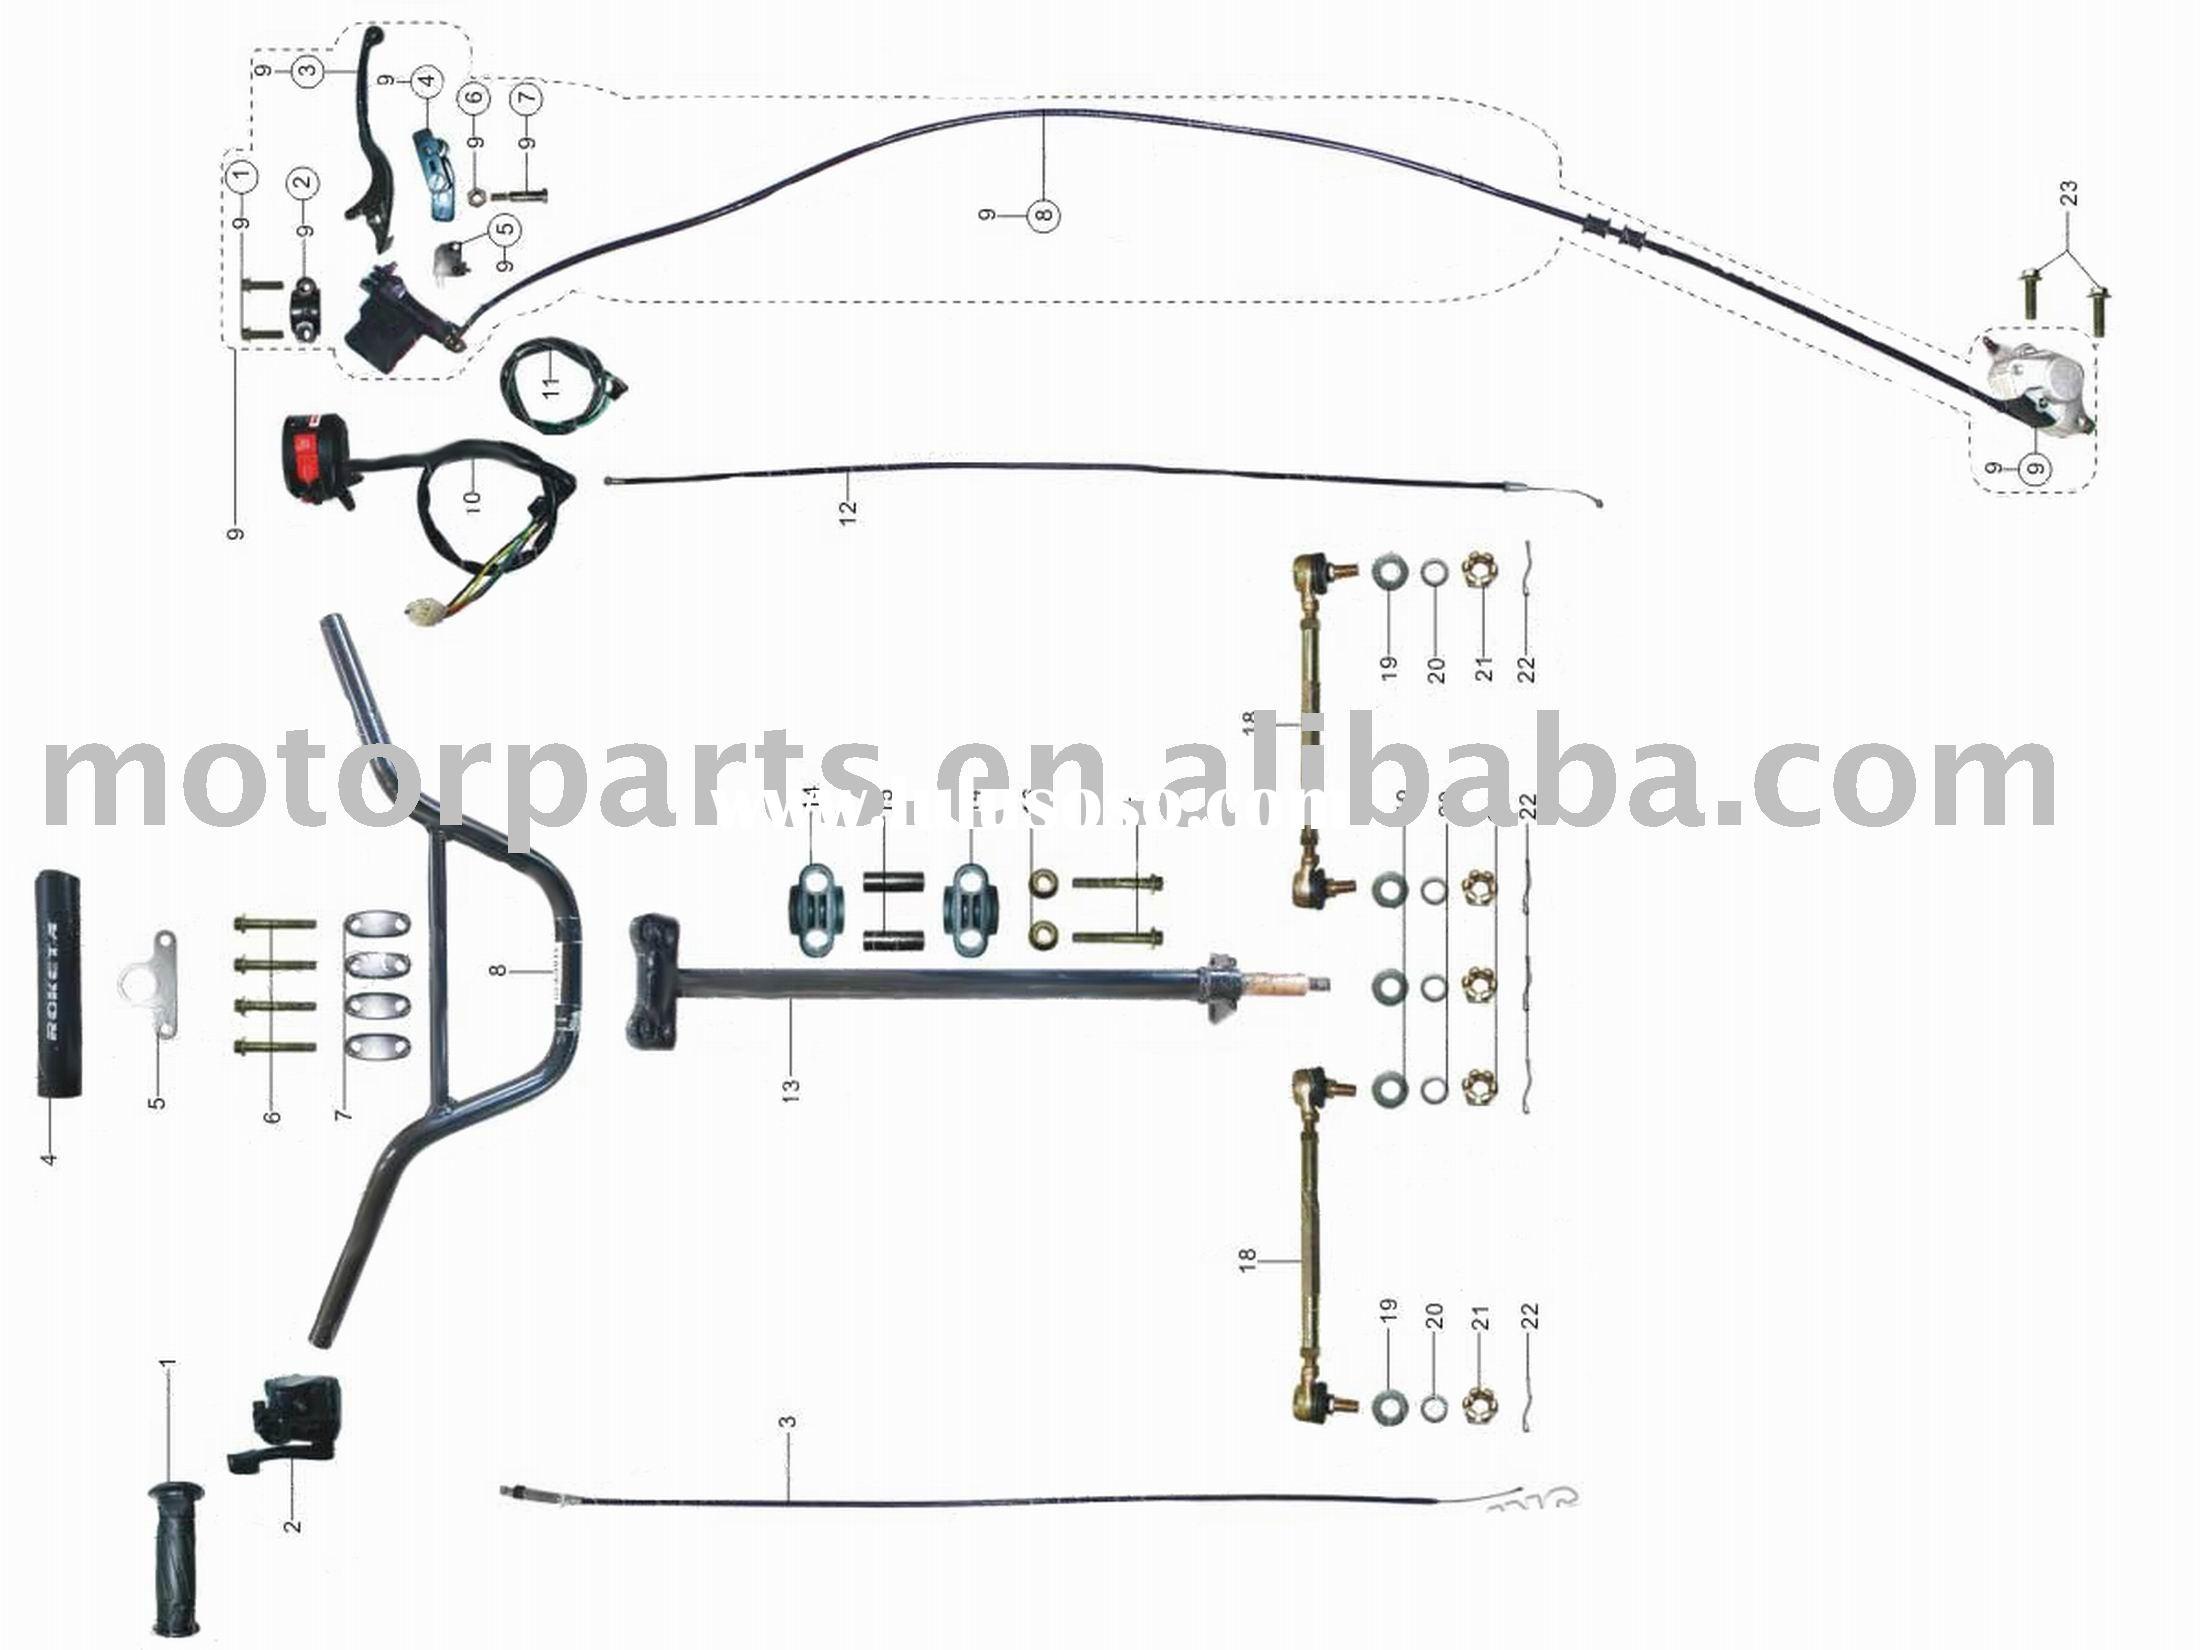 ND_2611] Redcat Atv Mpx110 Wiring Diagram Old Style Schematic Wiring | Redcat 110 Atv Wiring Diagram |  | Capem Hendil Mohammedshrine Librar Wiring 101